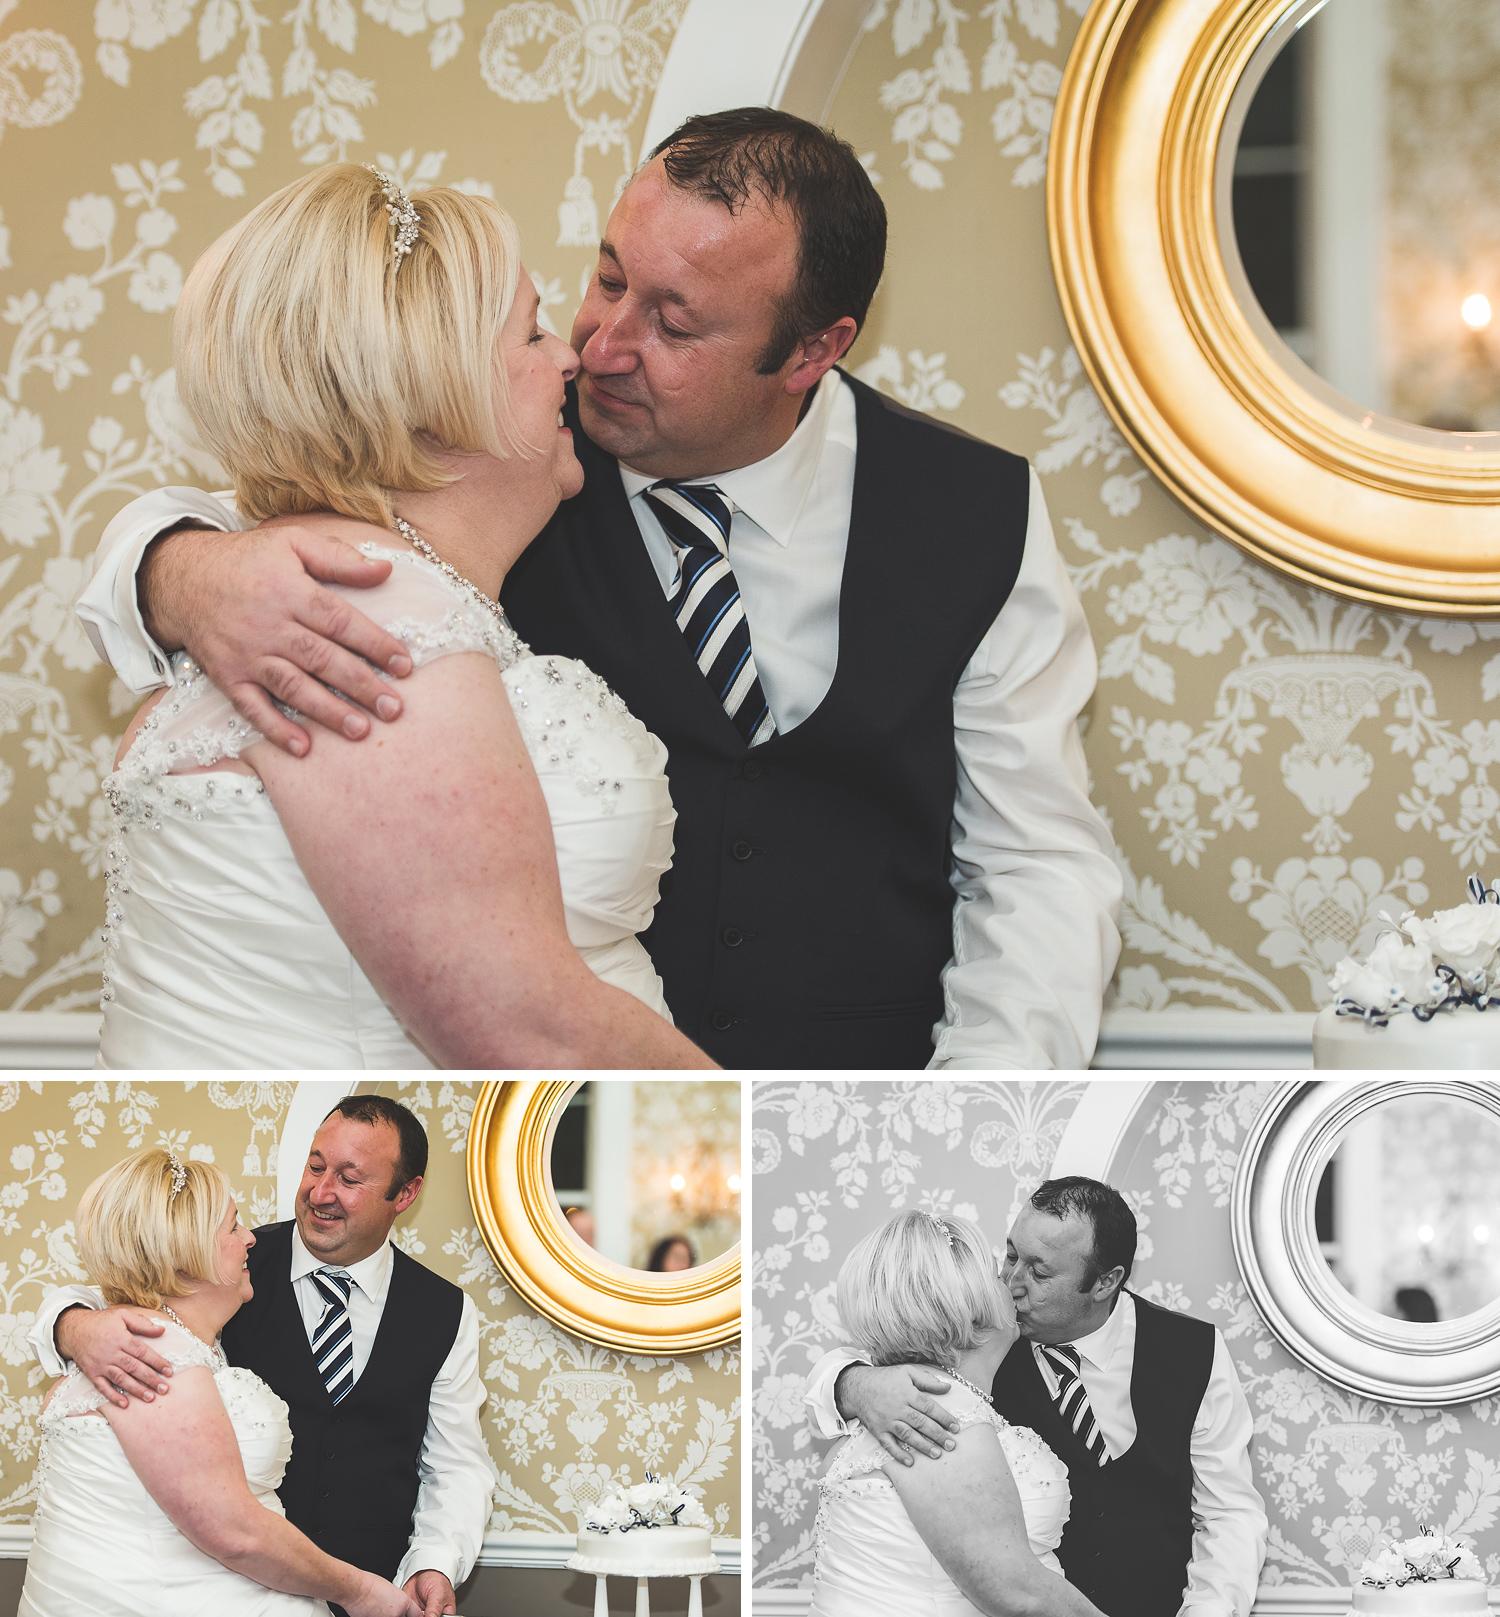 cake-wedding-photography-christchurch-dorset.jpg